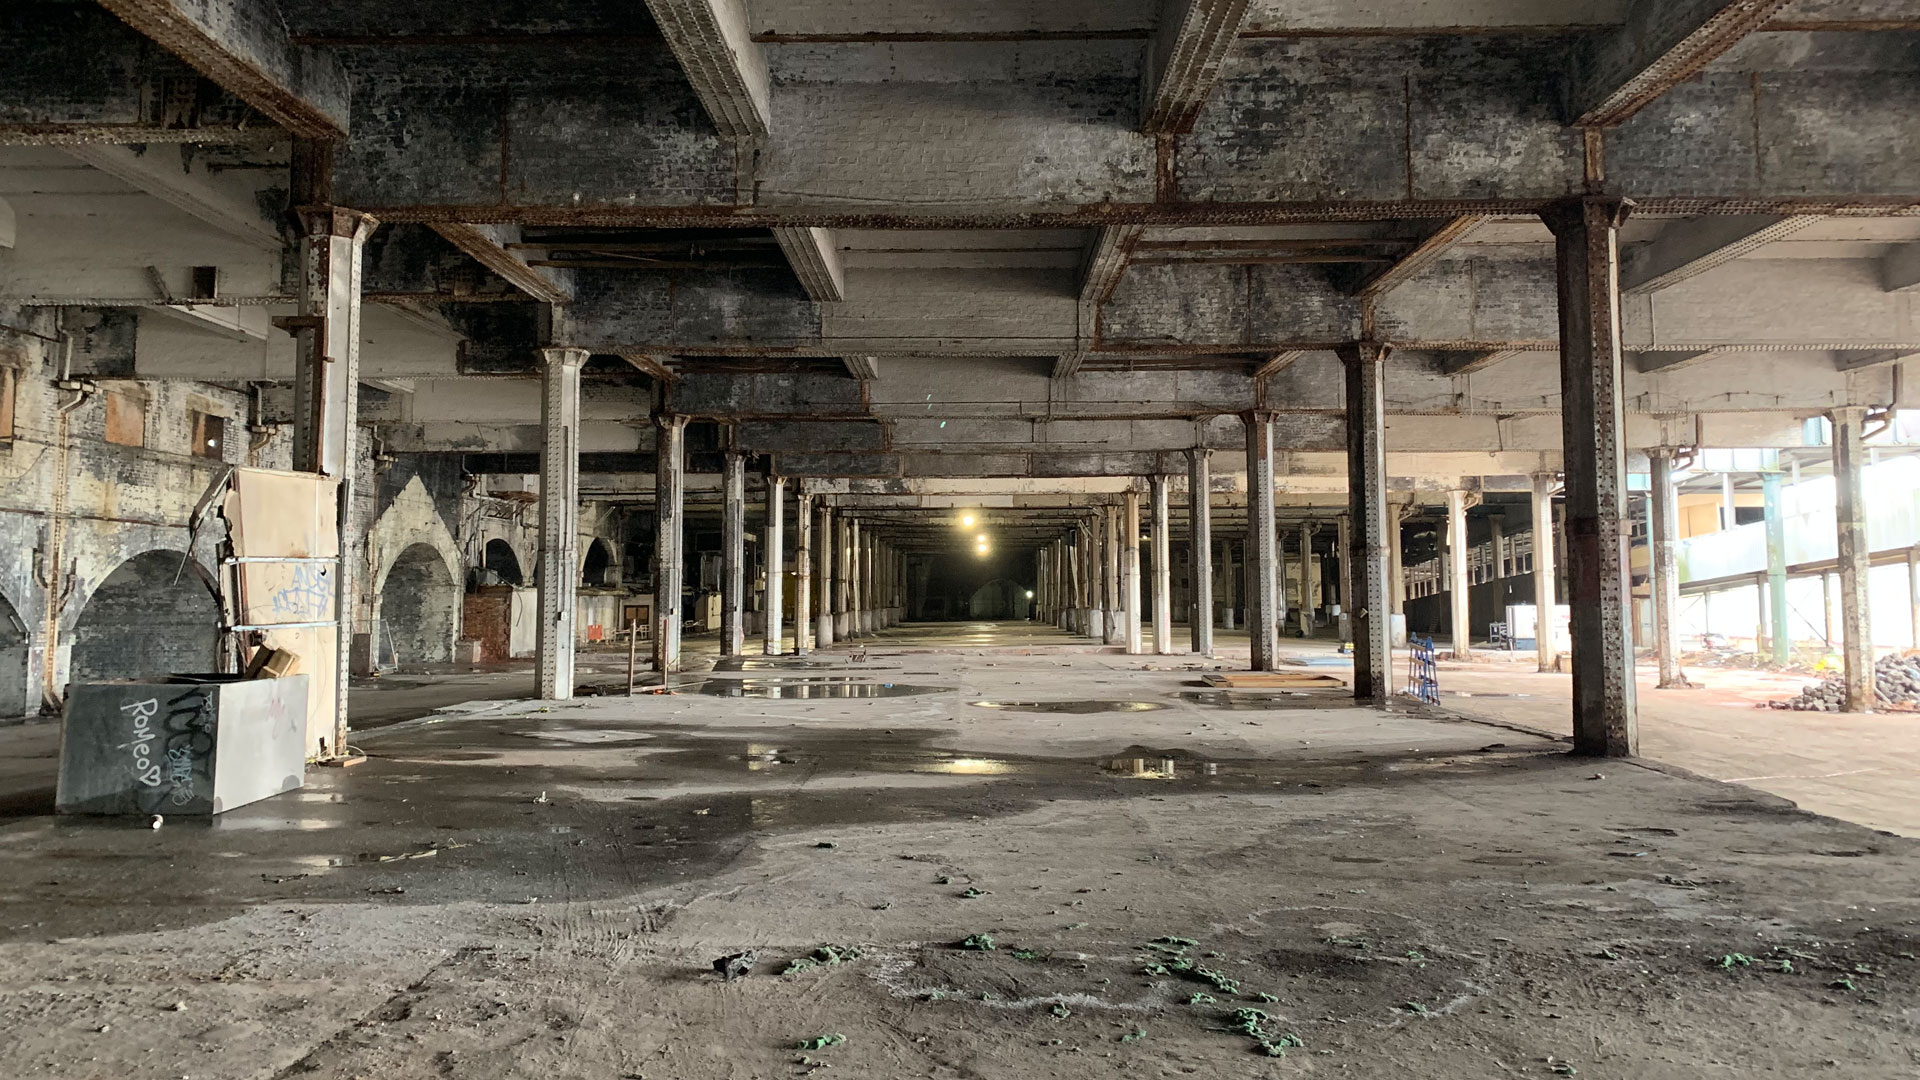 The_Depot_Mayfield_2.jpg